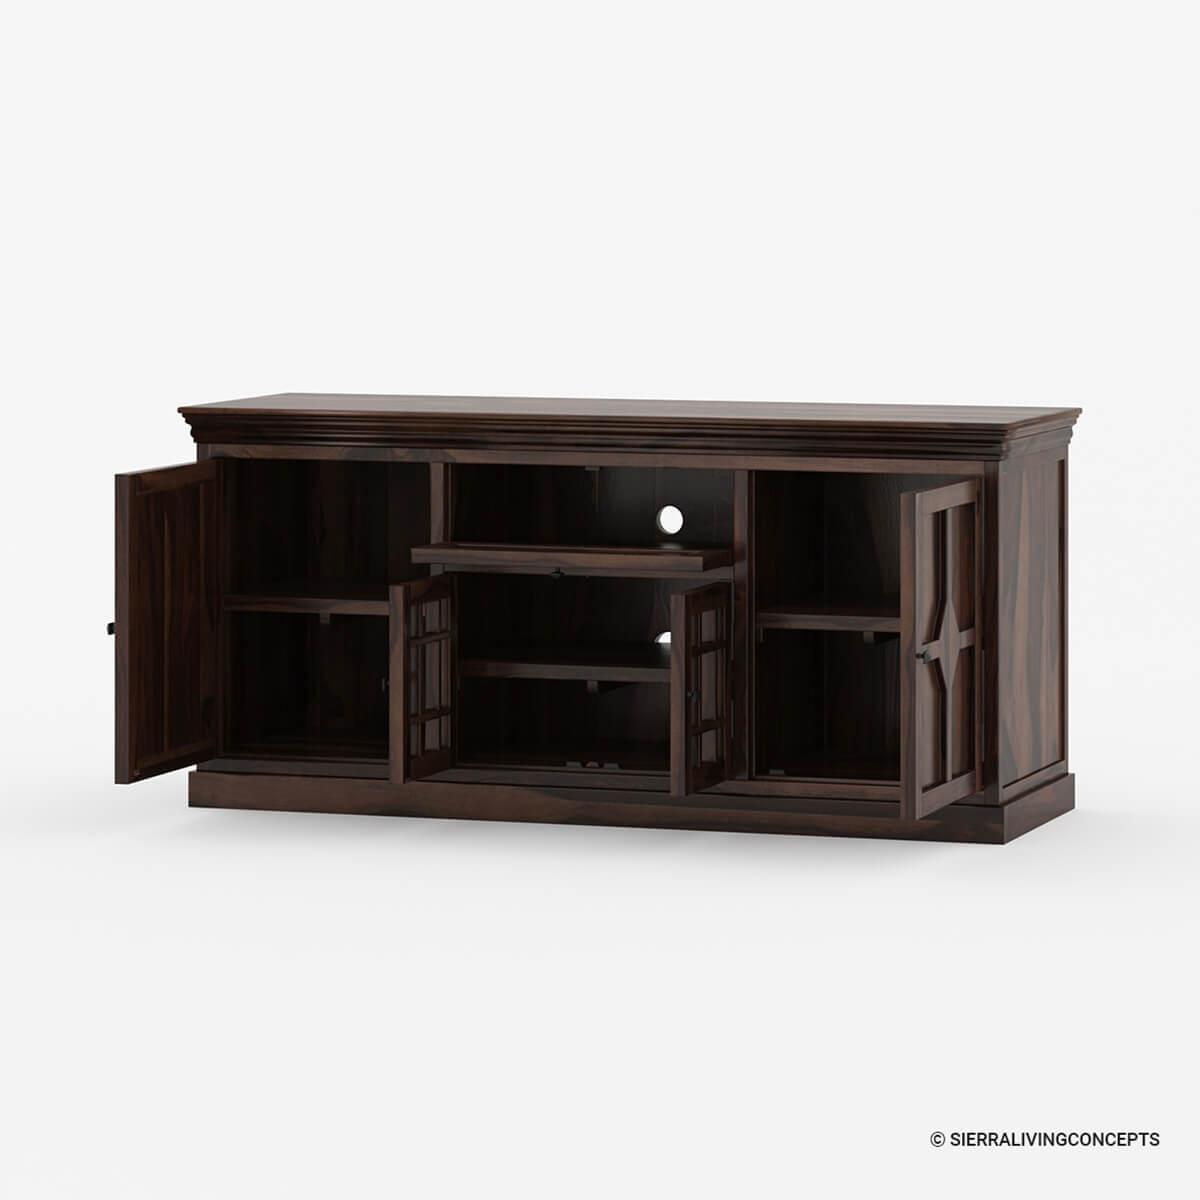 Santa Fe Rustic Solid Wood TV Console Cabinet